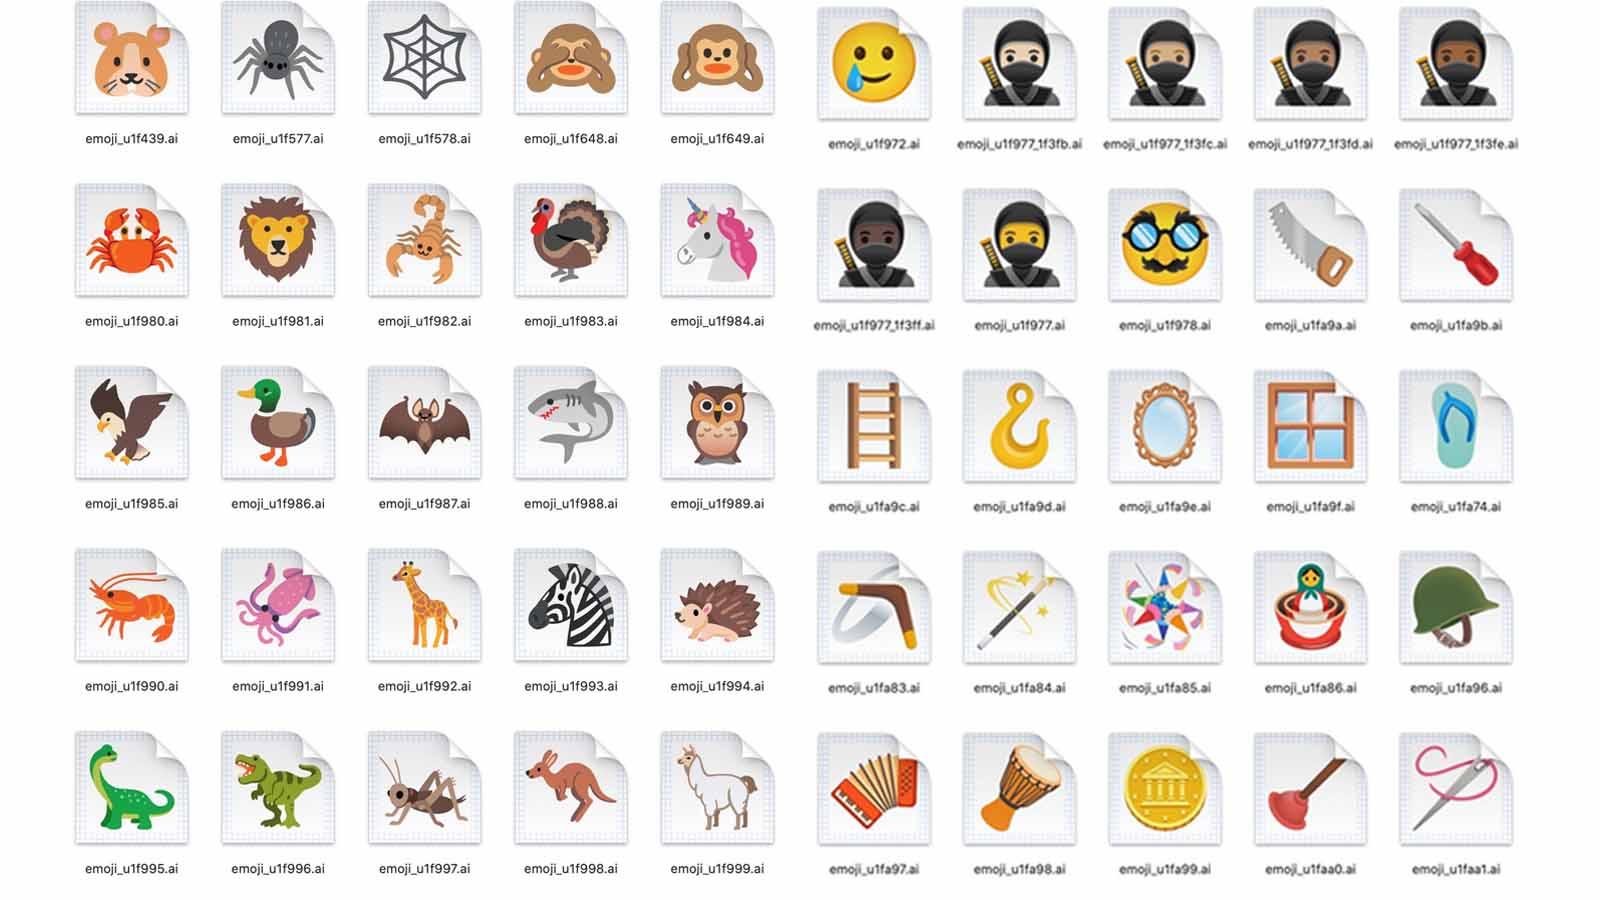 new android emoji 2020